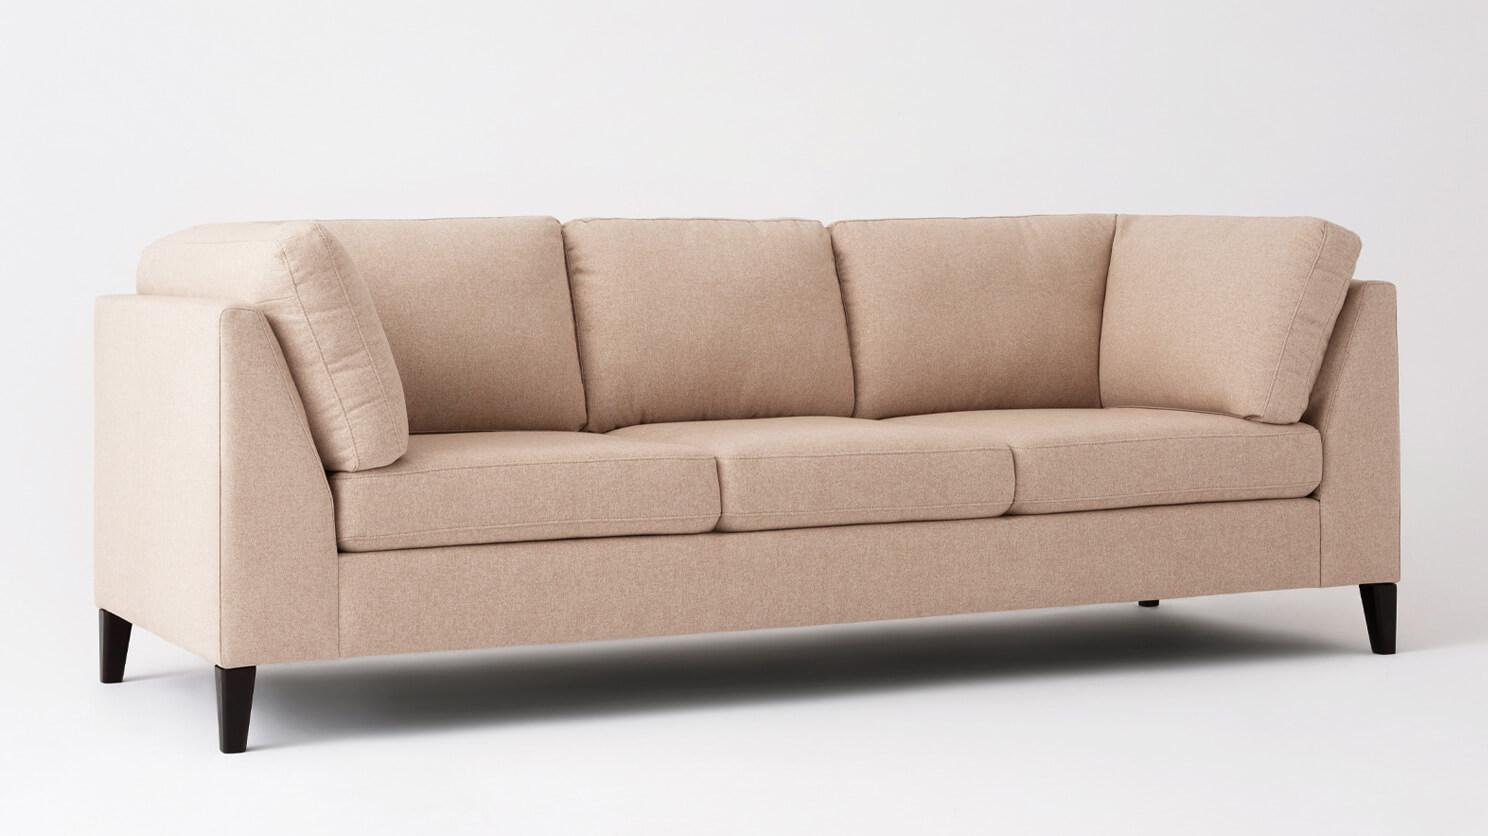 Cool Salema Sofa Ava Camel Ibusinesslaw Wood Chair Design Ideas Ibusinesslaworg